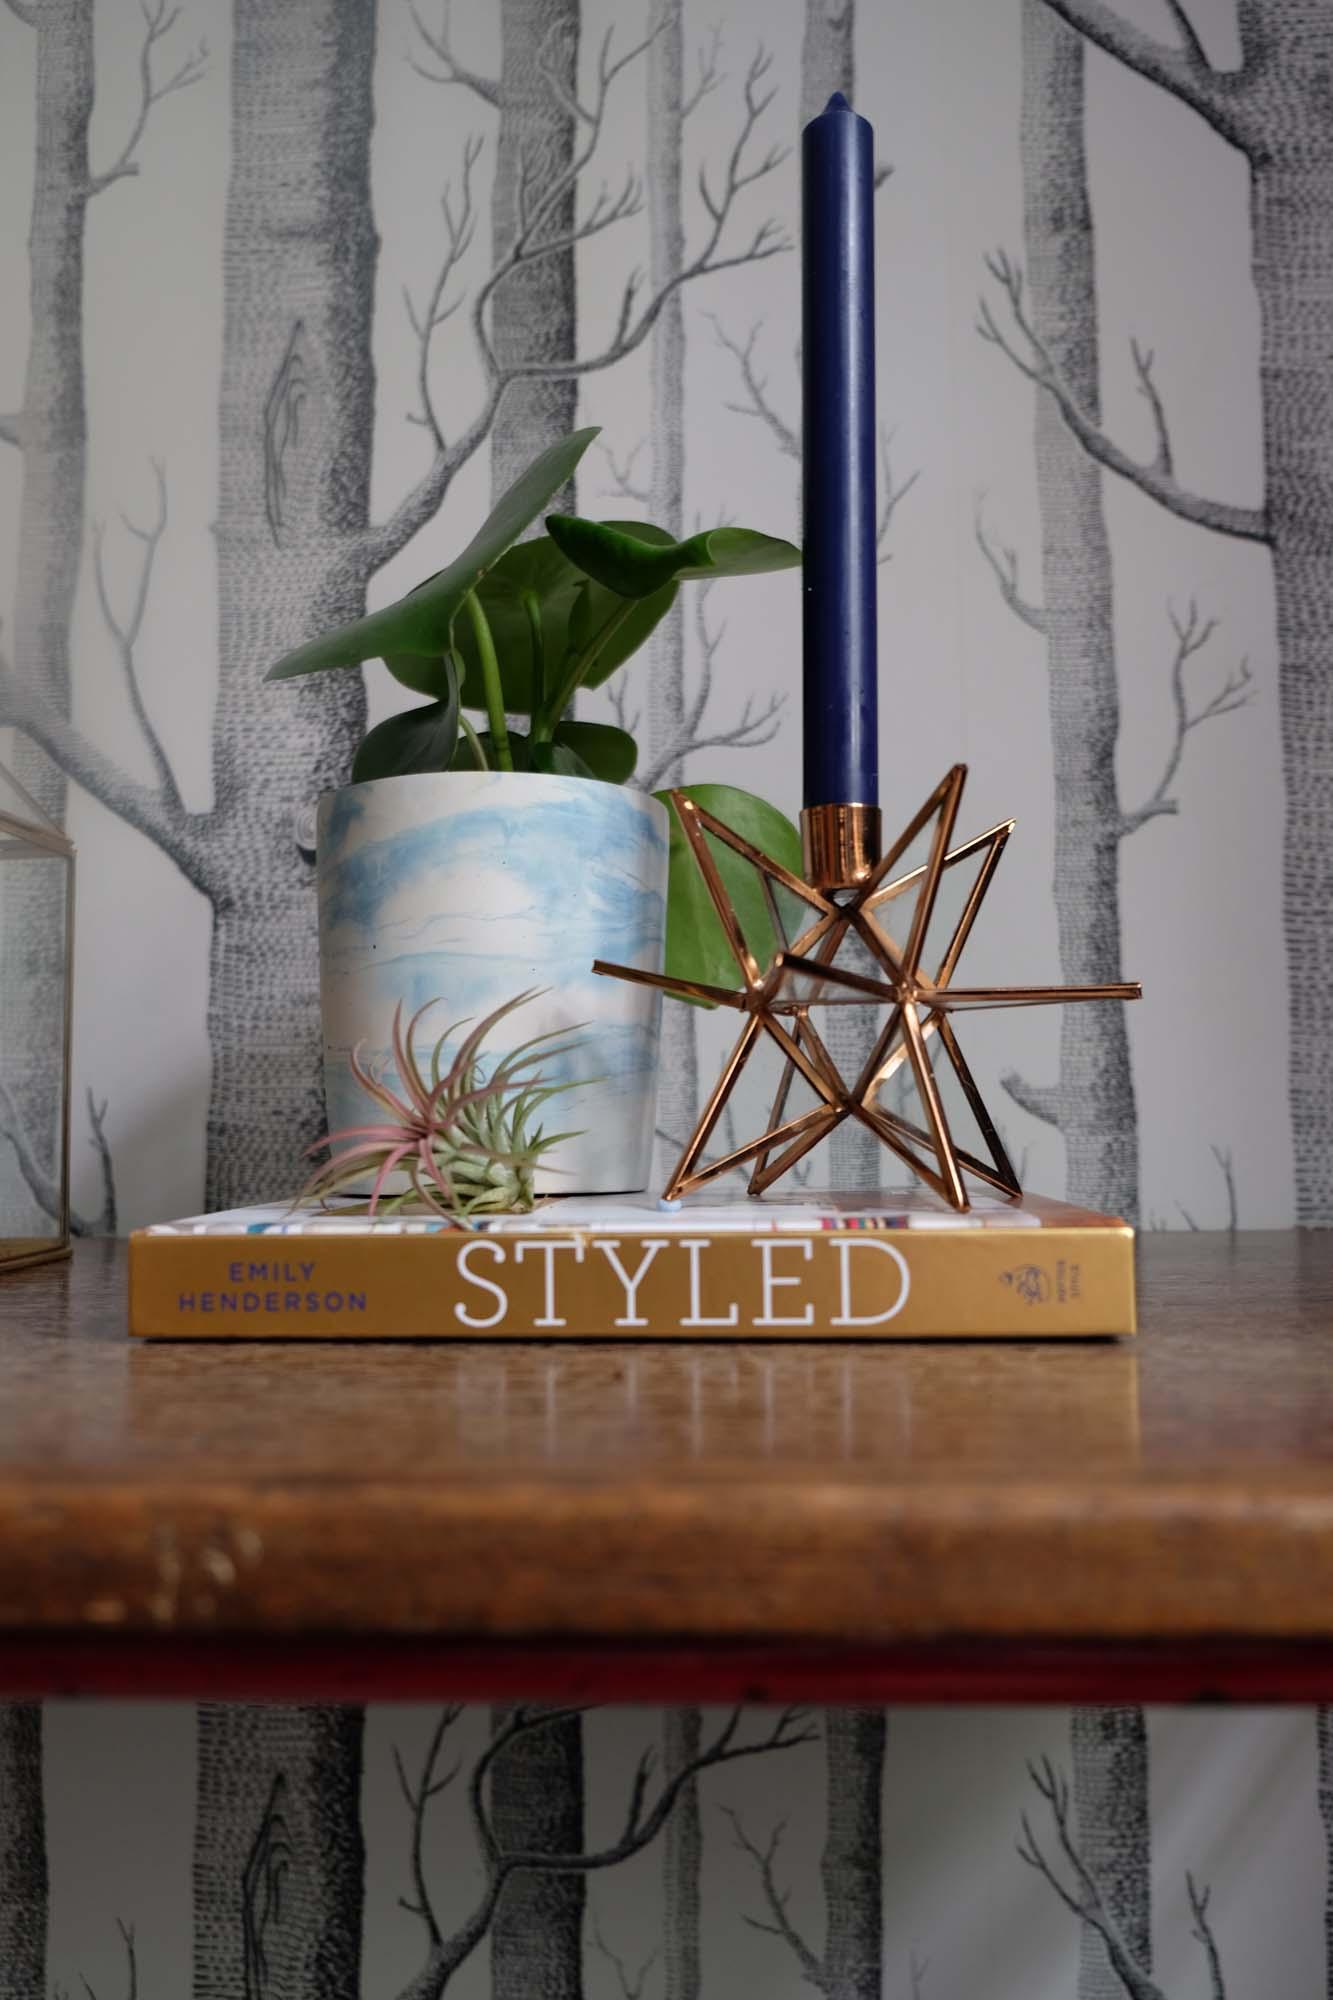 Copper  Estello candlestick ; Blue and white  marble effect plant holder ,both La Redoute